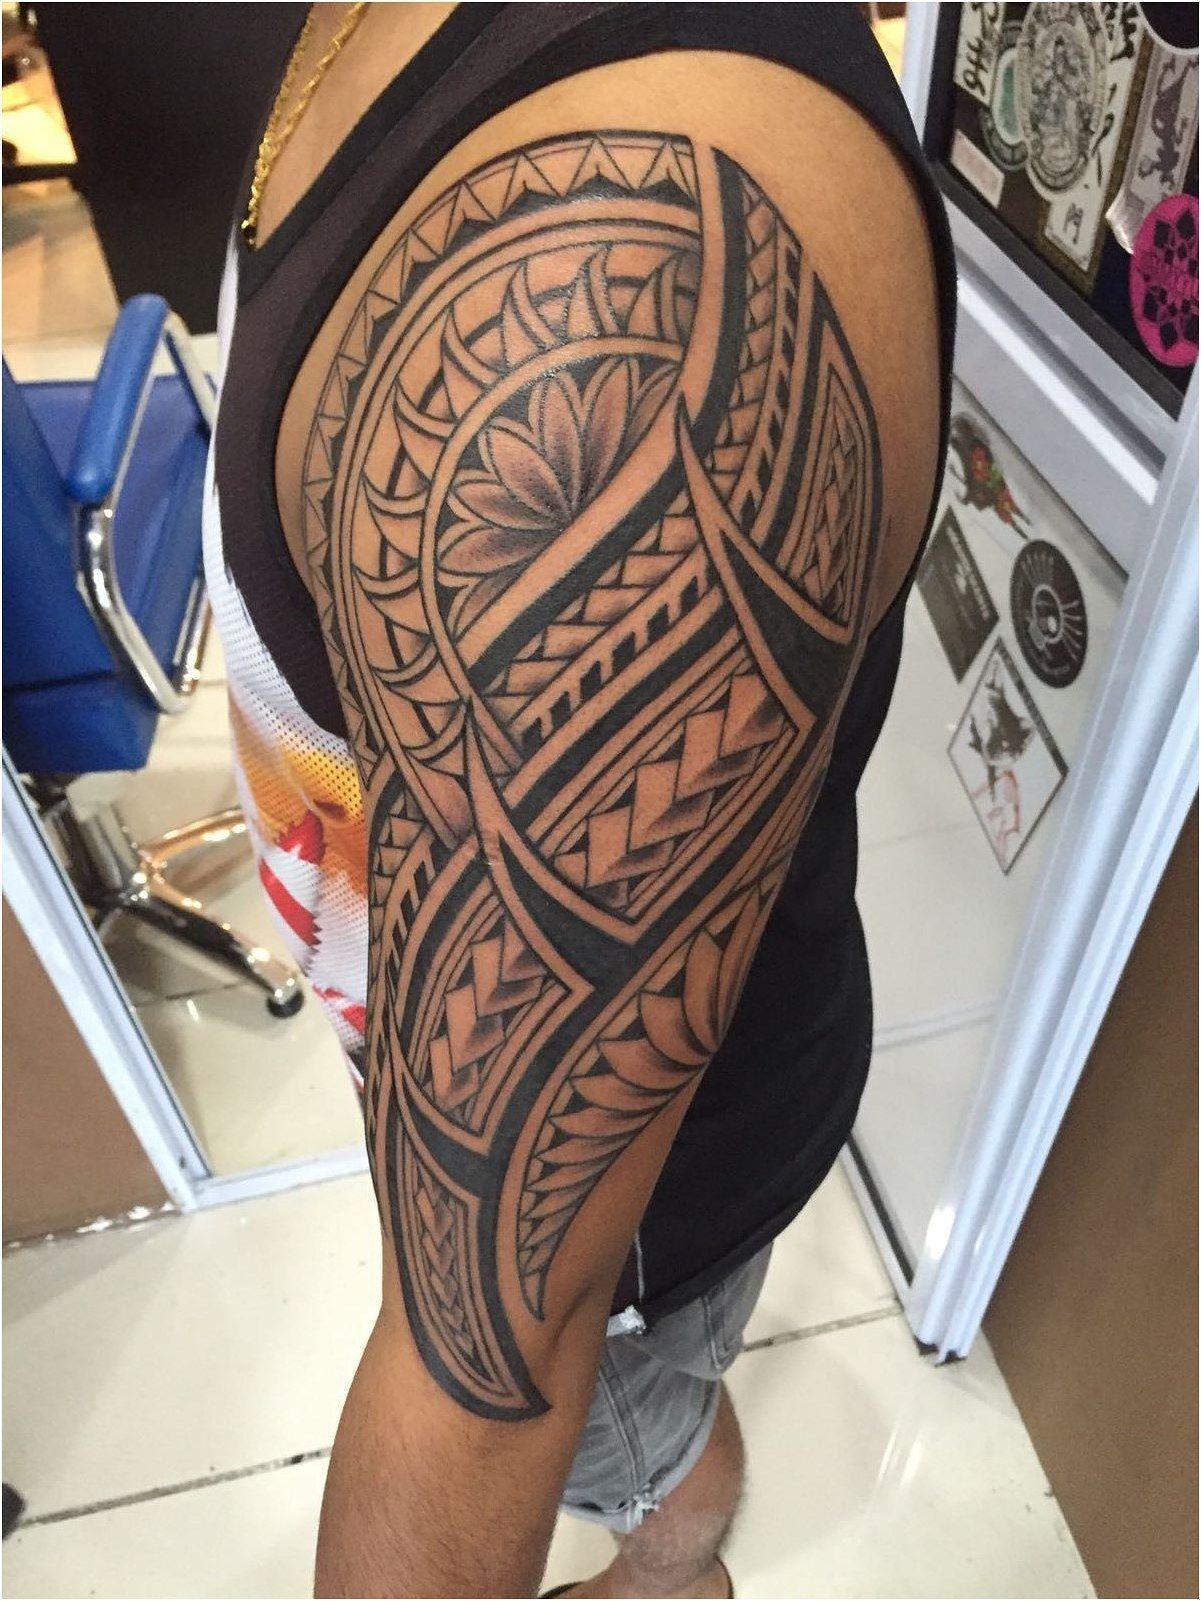 5 reasons why you should get a tattoo samoan tattoo